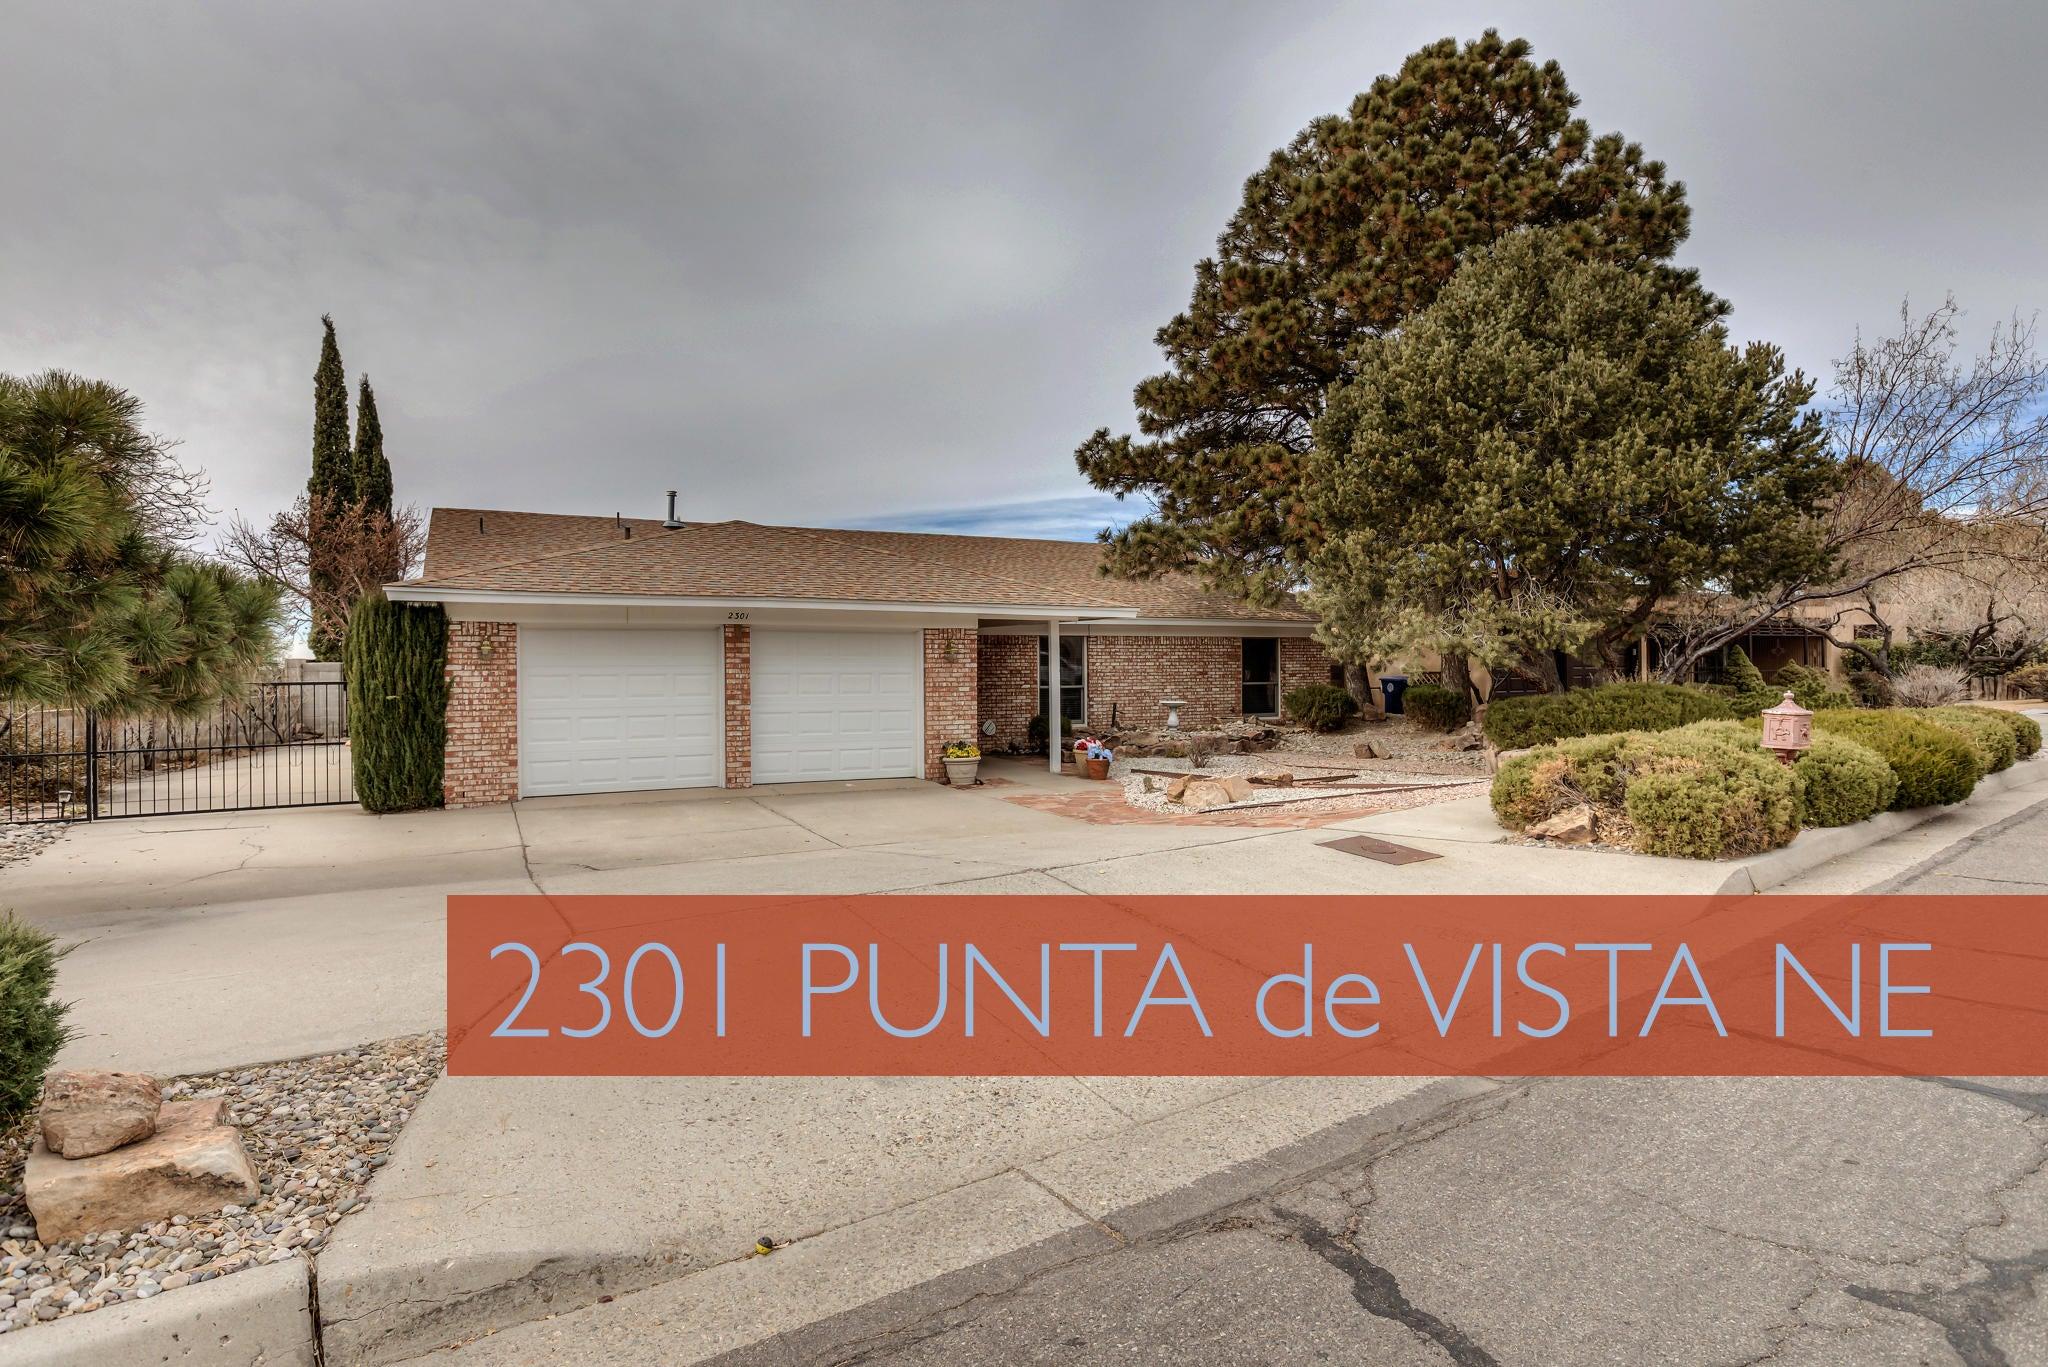 2301 Punta de Vista Drive NE, Albuquerque, NM 87112